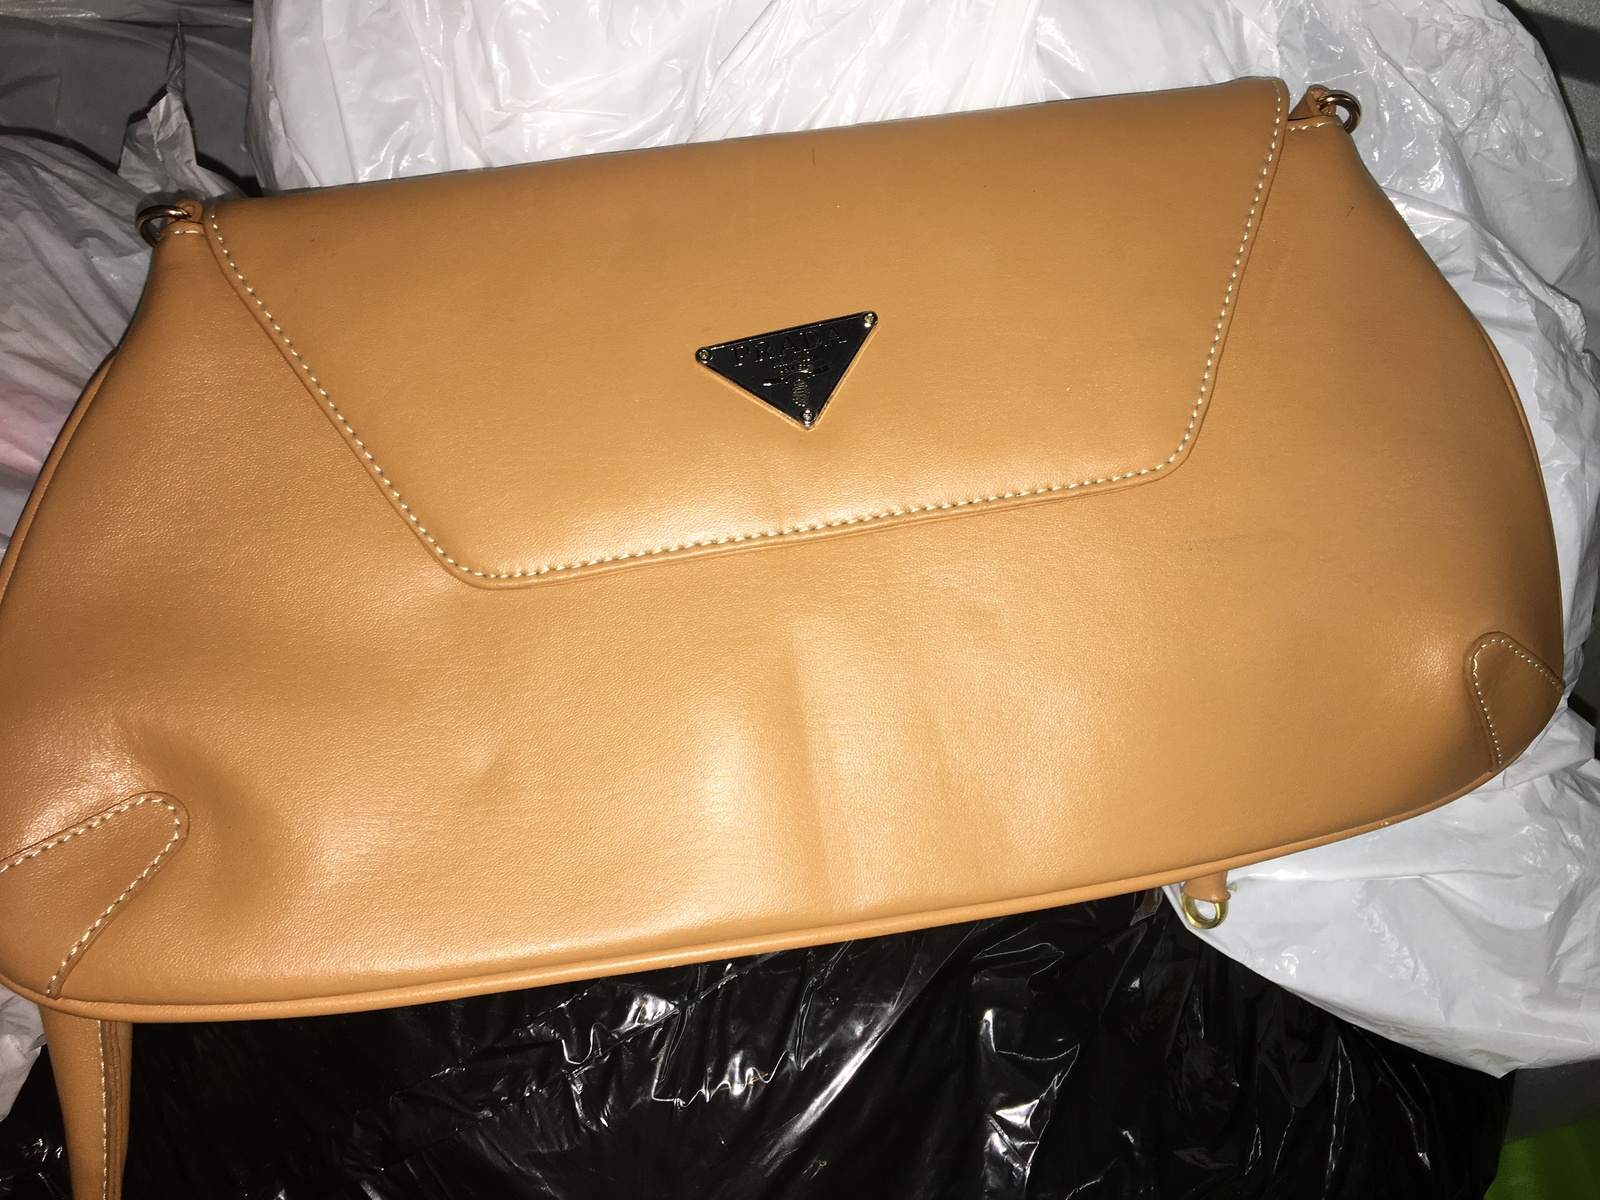 47cf6cde23db Prada handbag and 50 similar items. 9e2fd38e 6092 4d31 8a4c 15a8ad2887b9